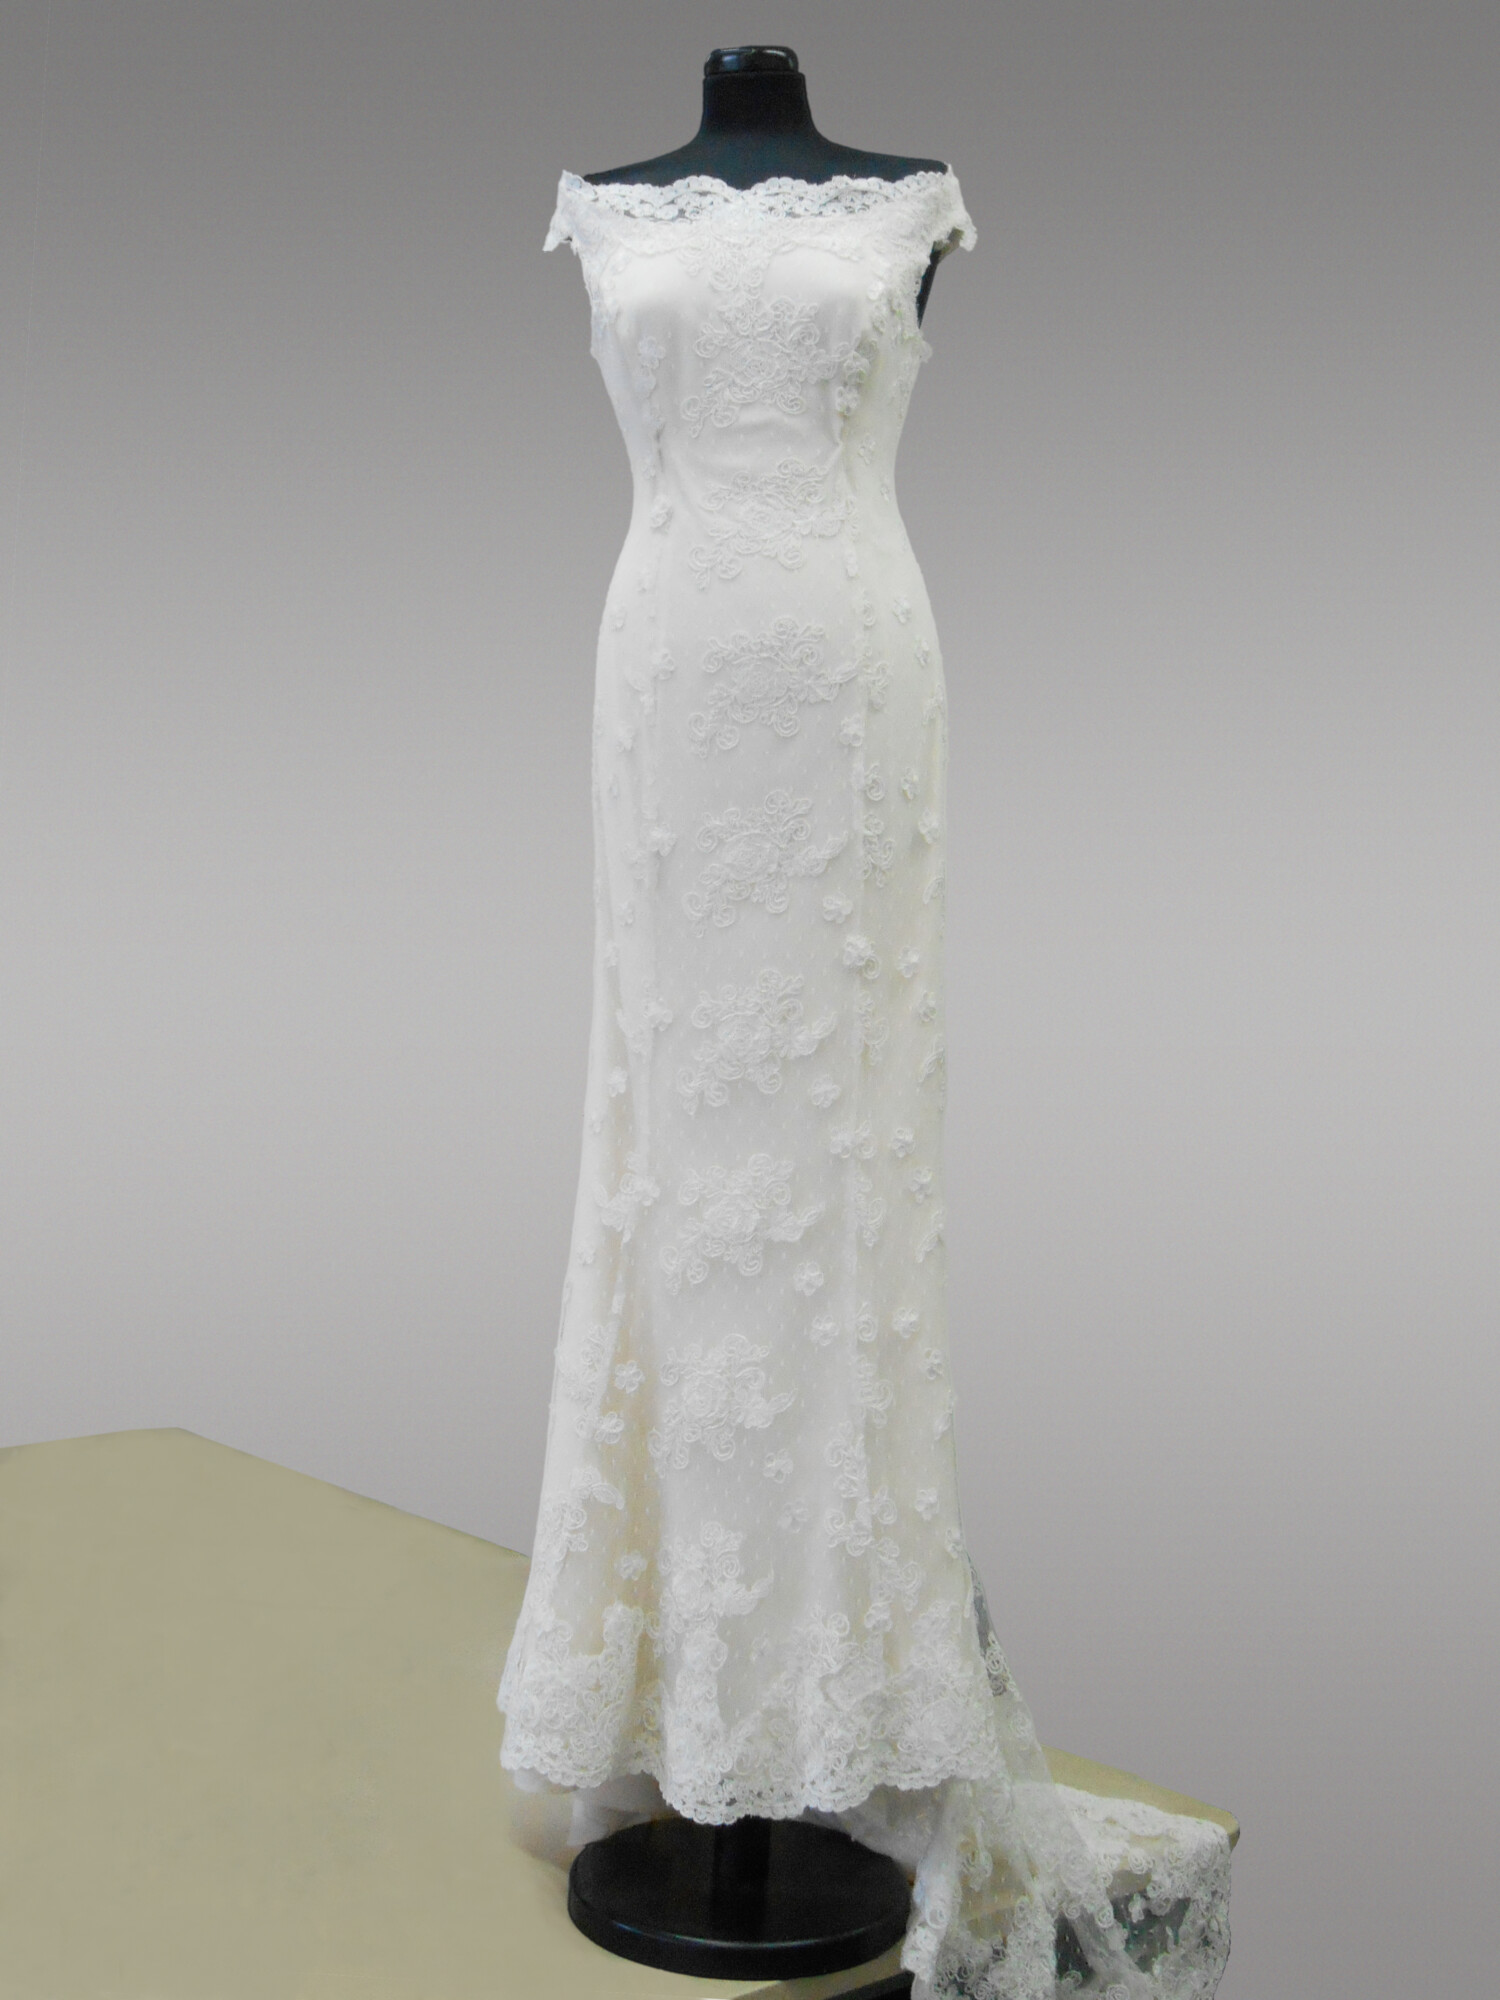 Di Toro Sposa Lace Wedding Gown